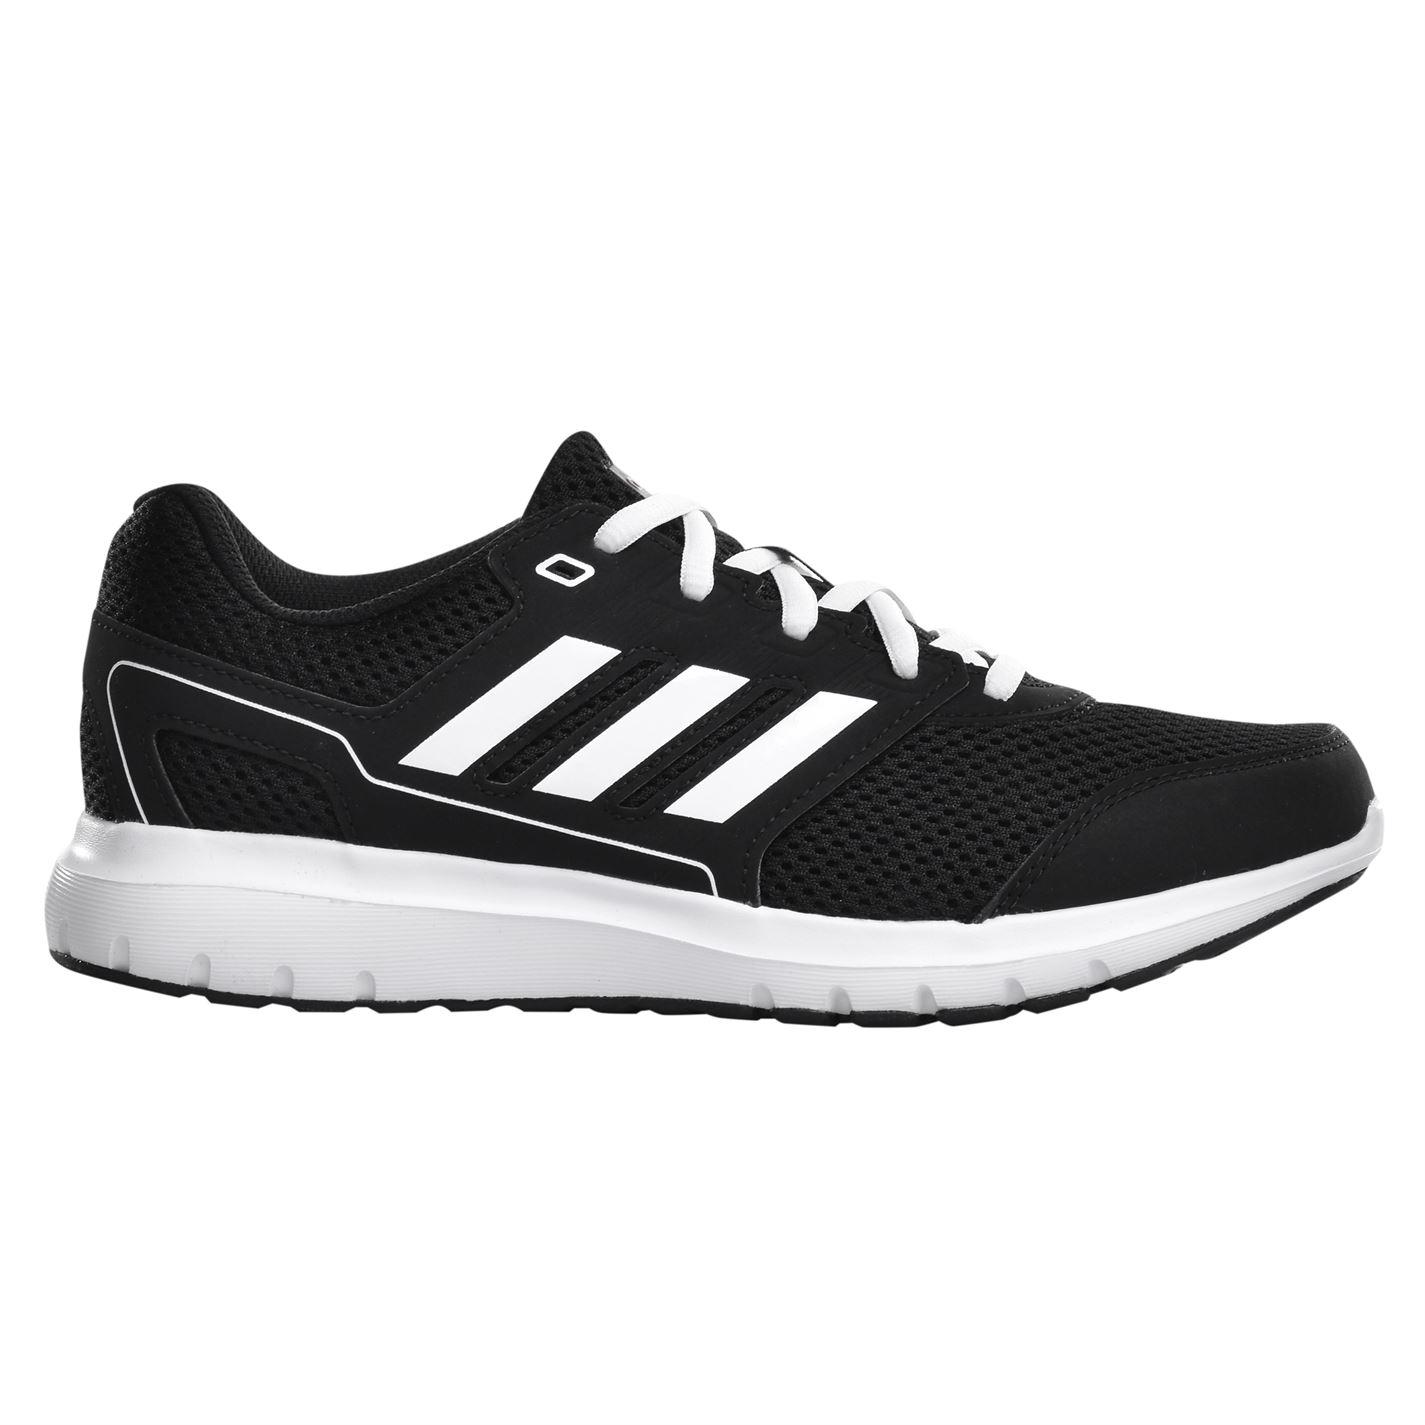 Adidas Duramo Lite 2 Womens Trainers